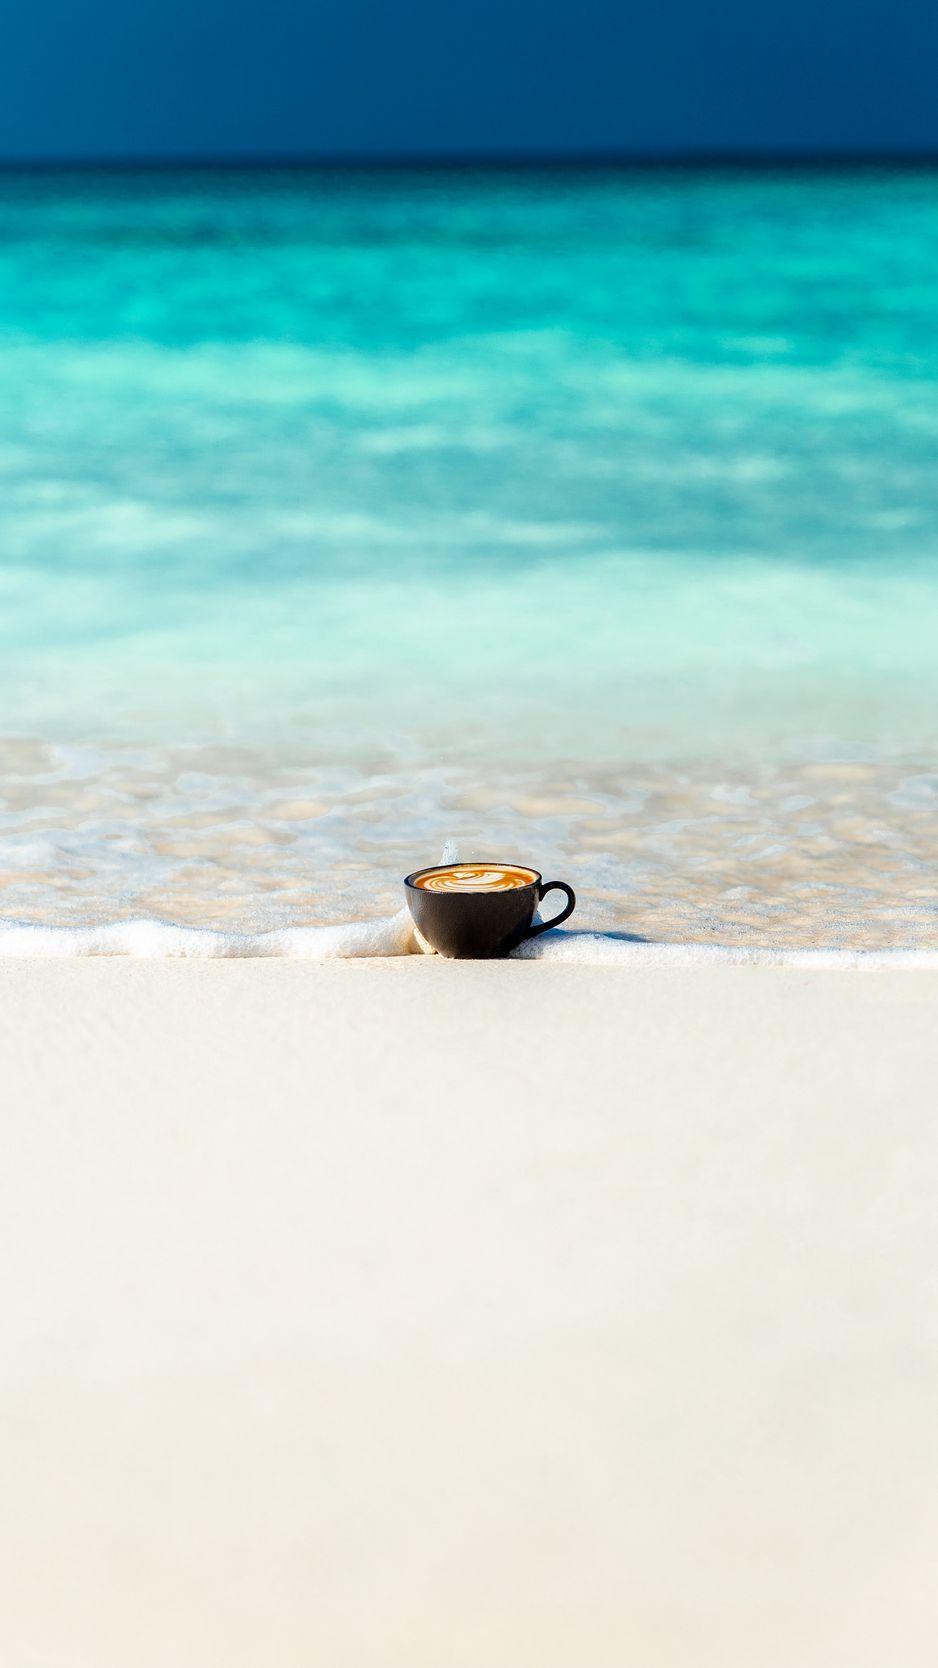 938x1668 Wallpaper cup, ocean, sand, coast, minimalism